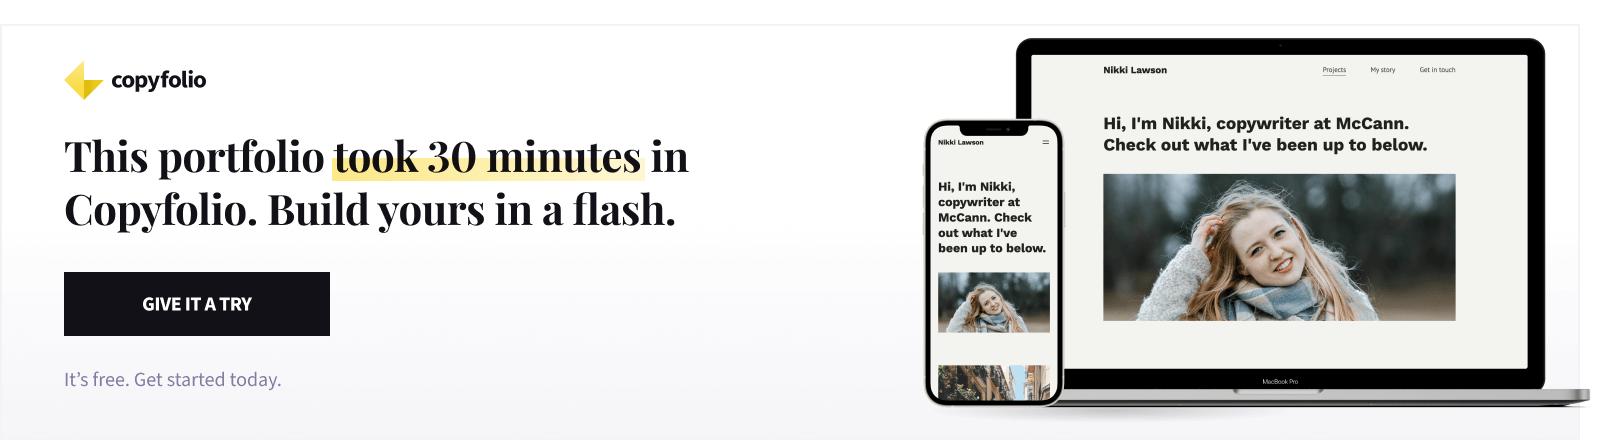 This portfolio took 30 minutes in Copyfolio. Build yours in a flash.